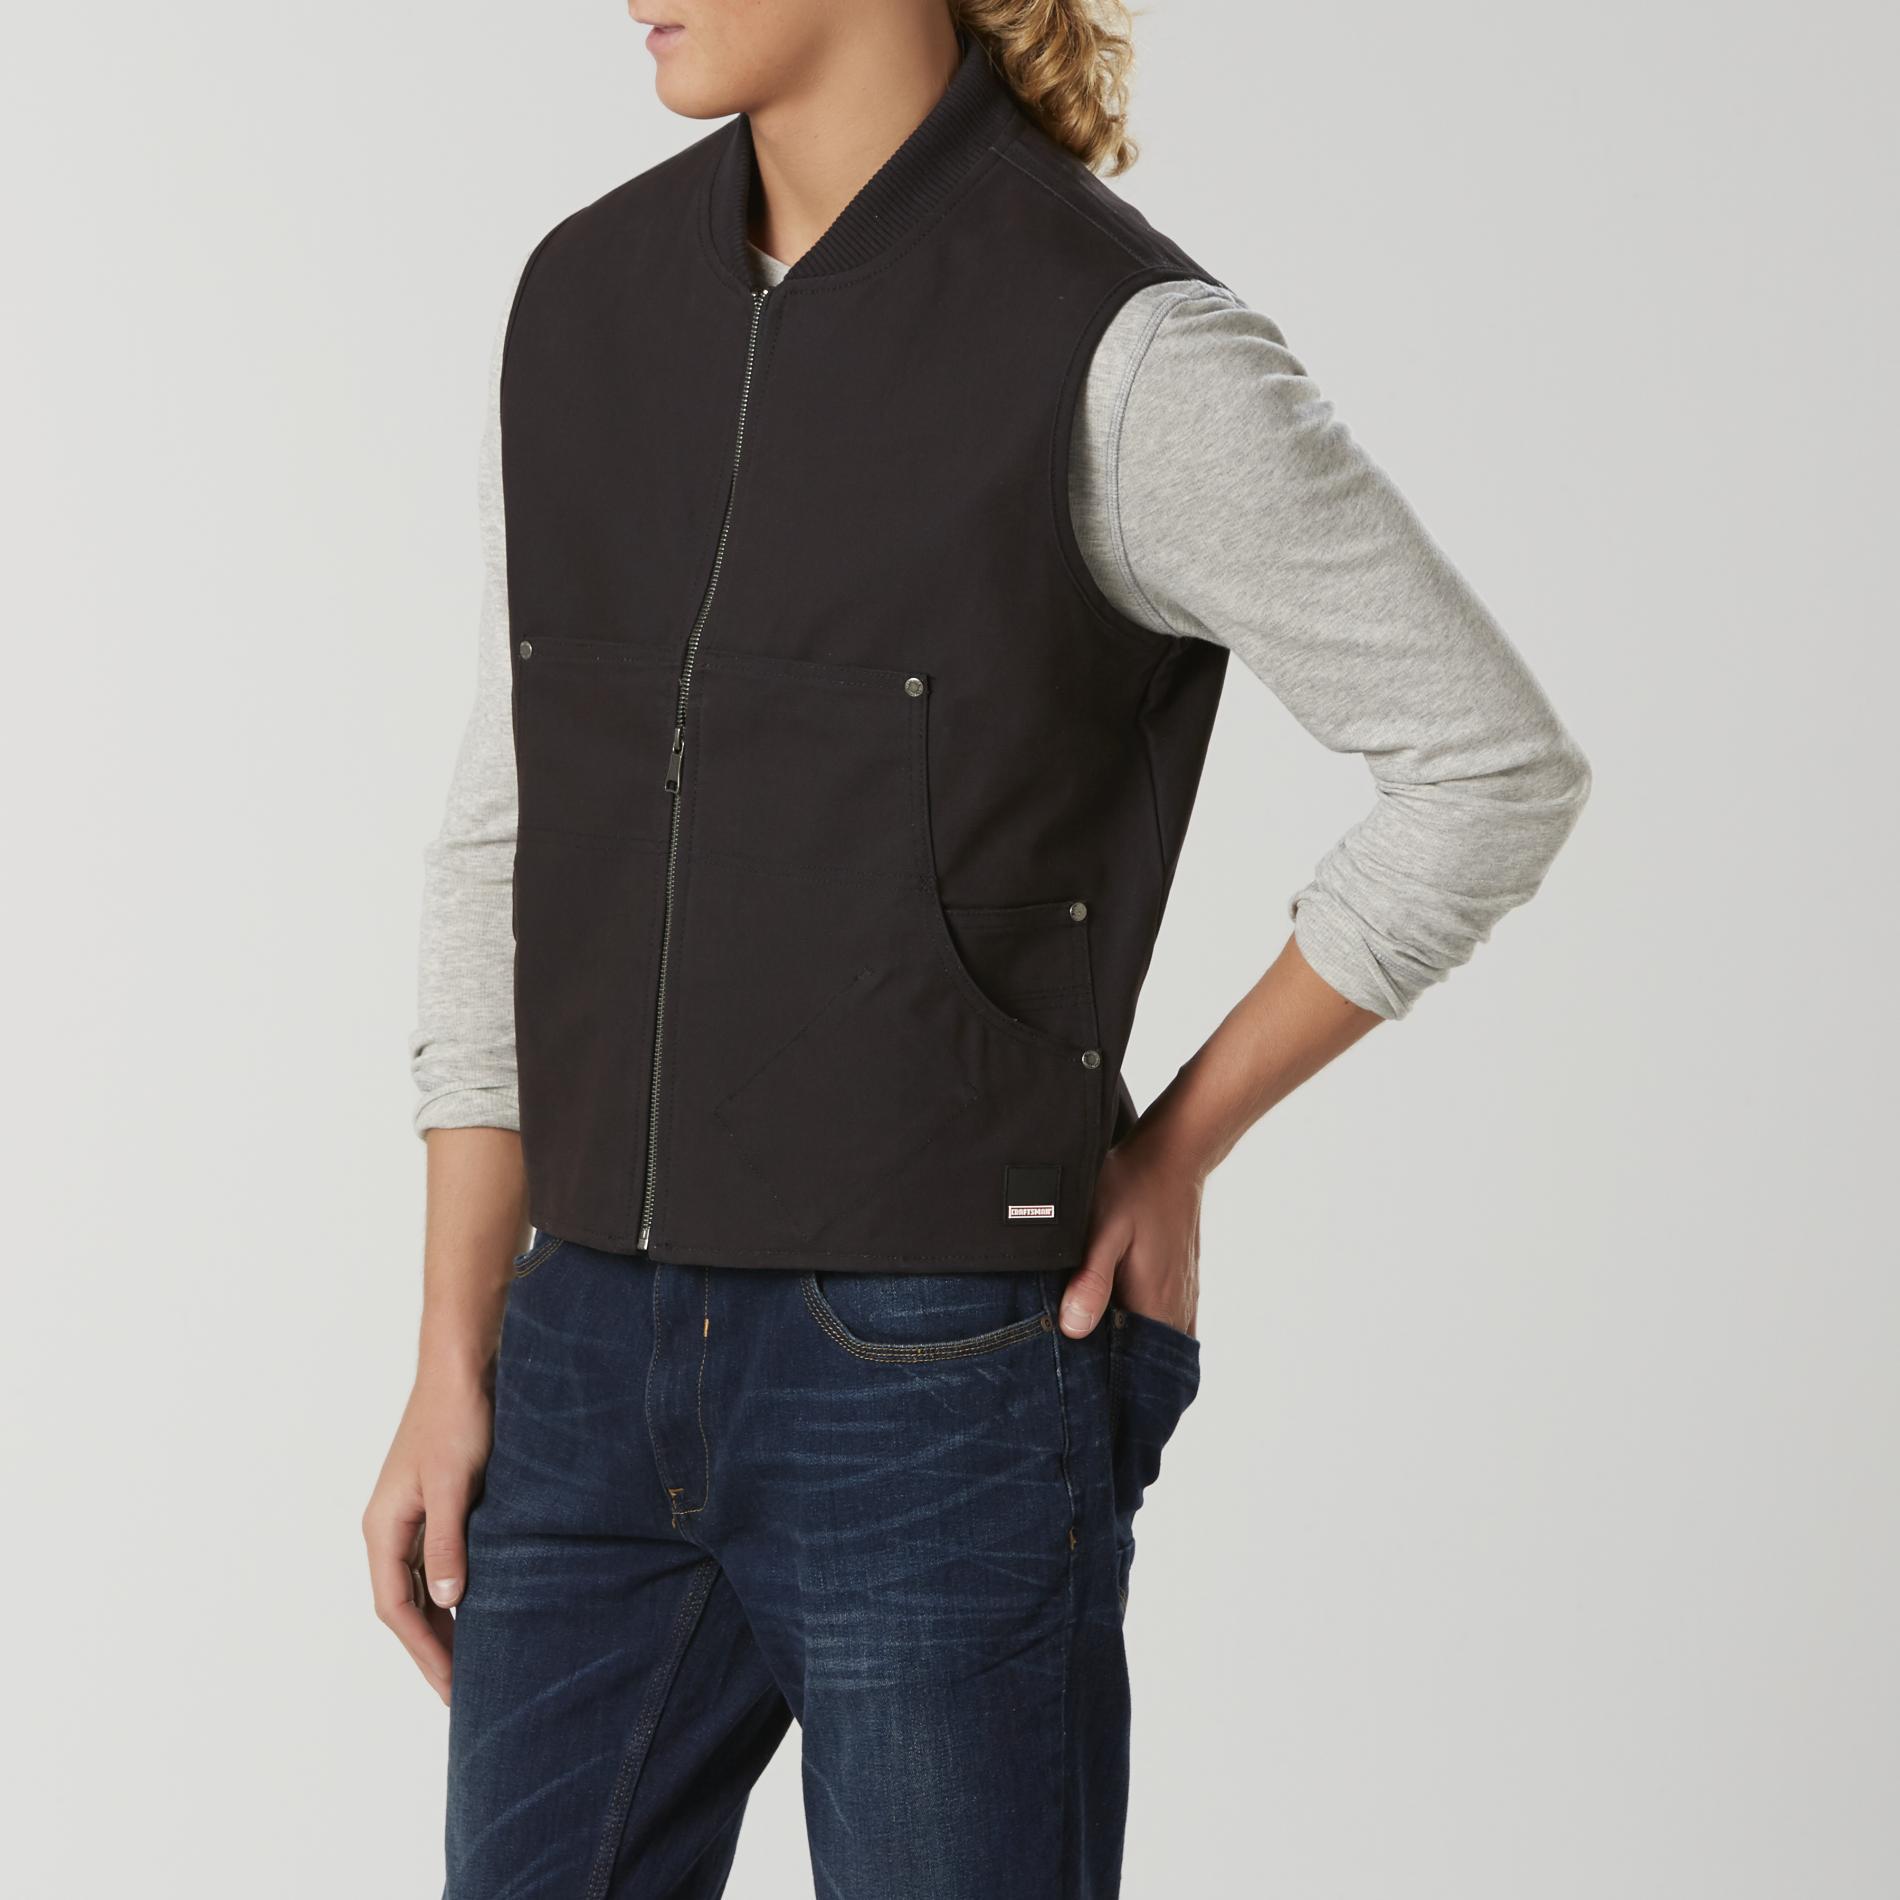 Craftsman Men's Utility Vest, Size: Large, Rubber im test